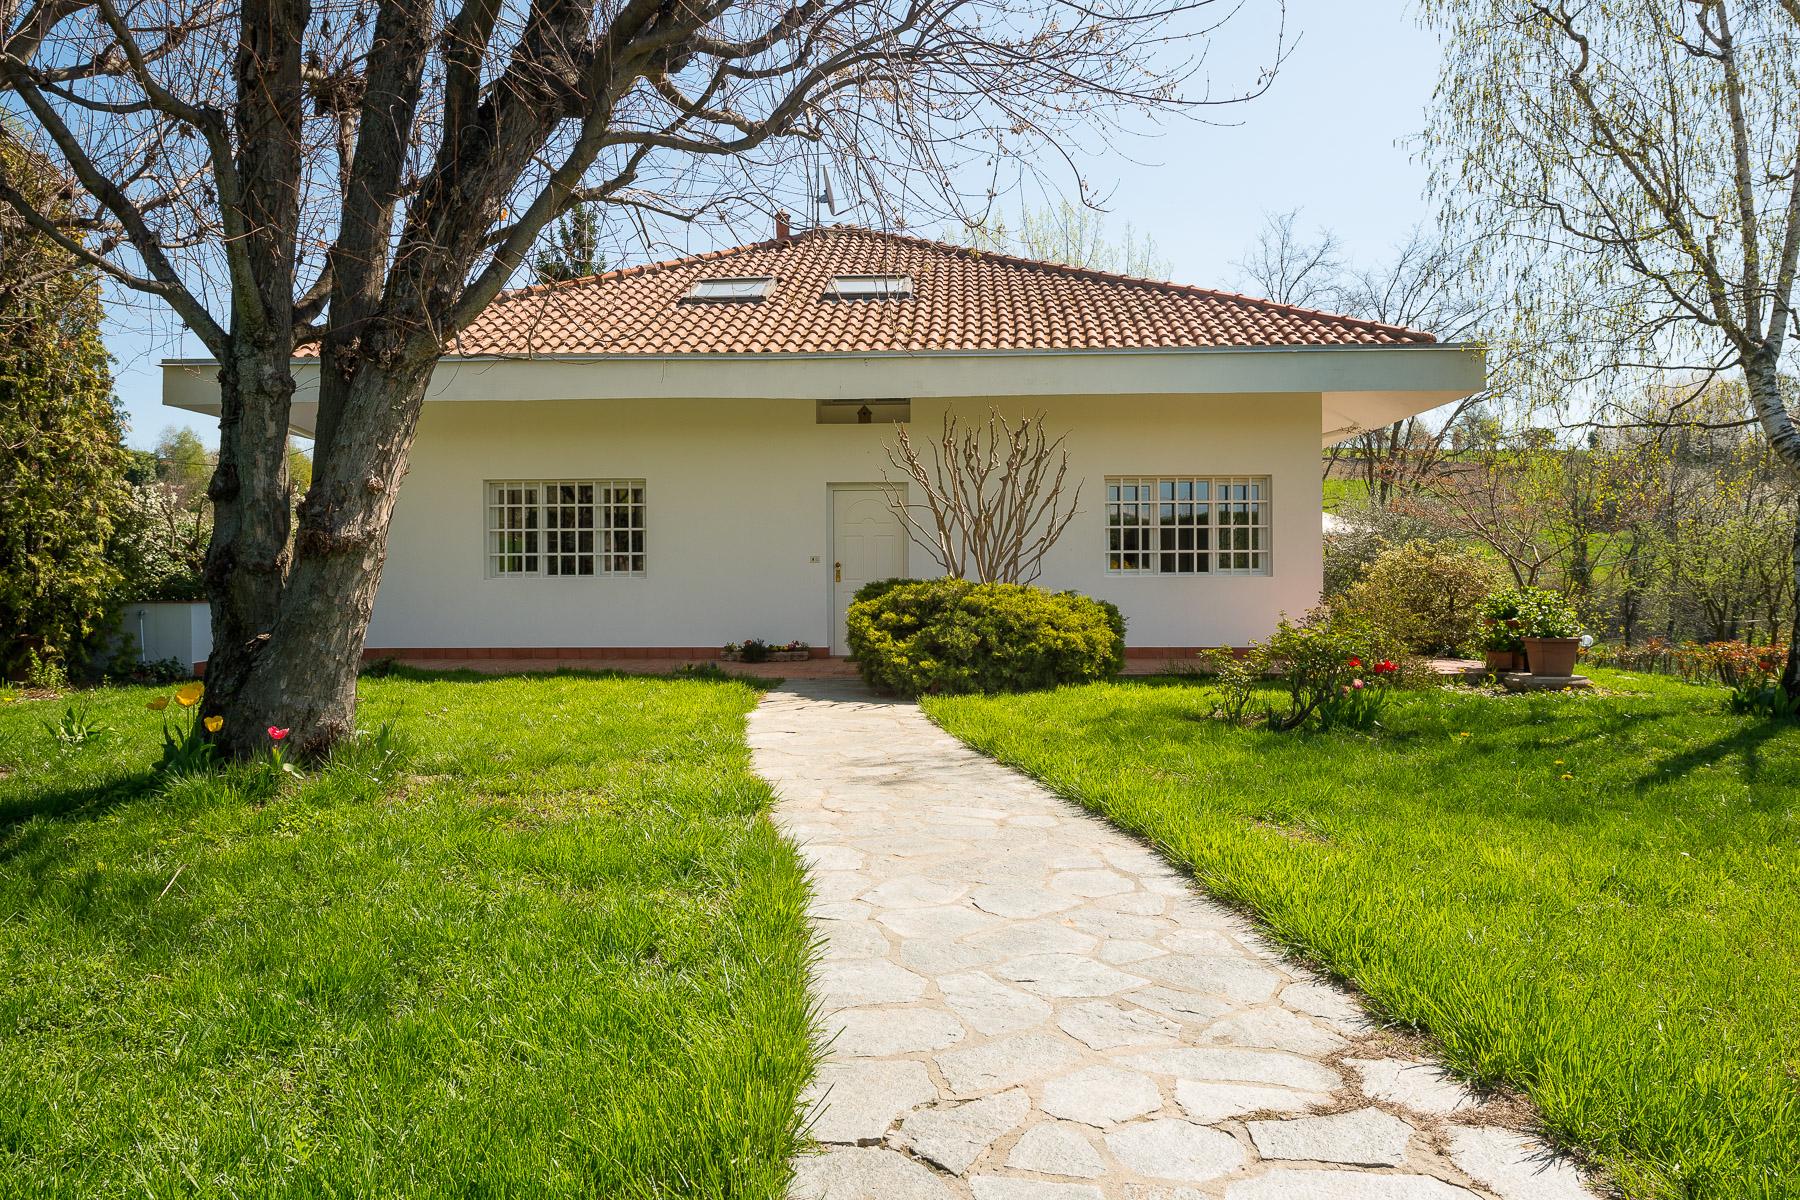 Villa in Vendita a Pino Torinese:  5 locali, 350 mq  - Foto 1